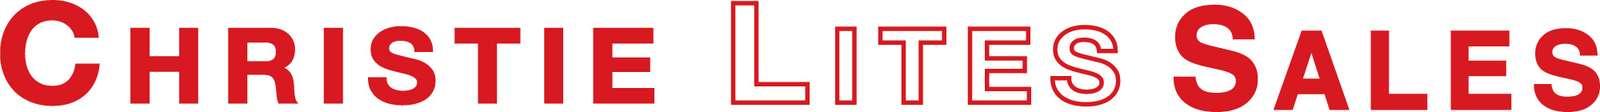 christie_lites_logo_rgb_copie.jpg